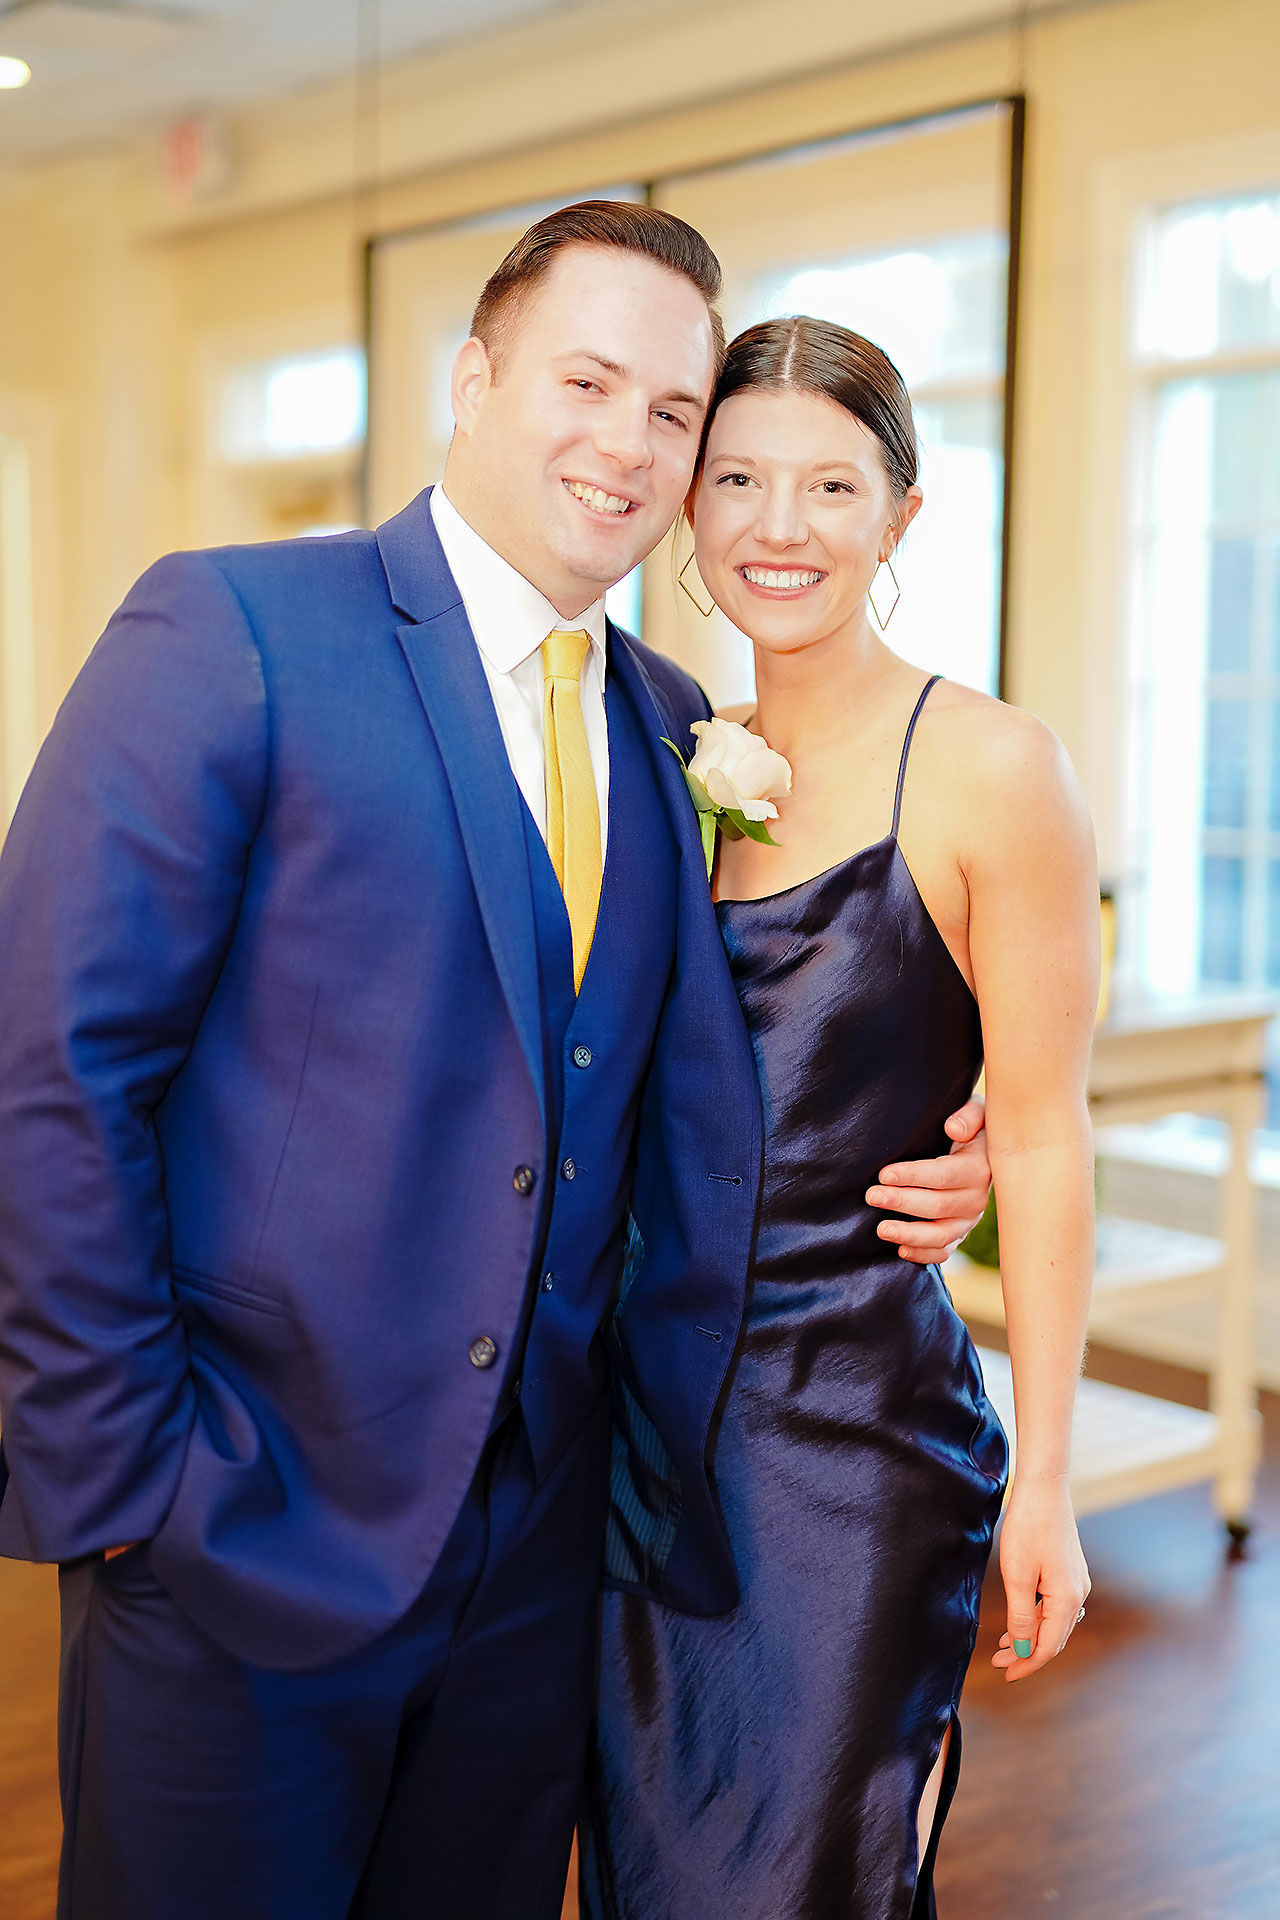 Nadia Parker Black Iris Estate Carmel Indiana Wedding May 2021 287